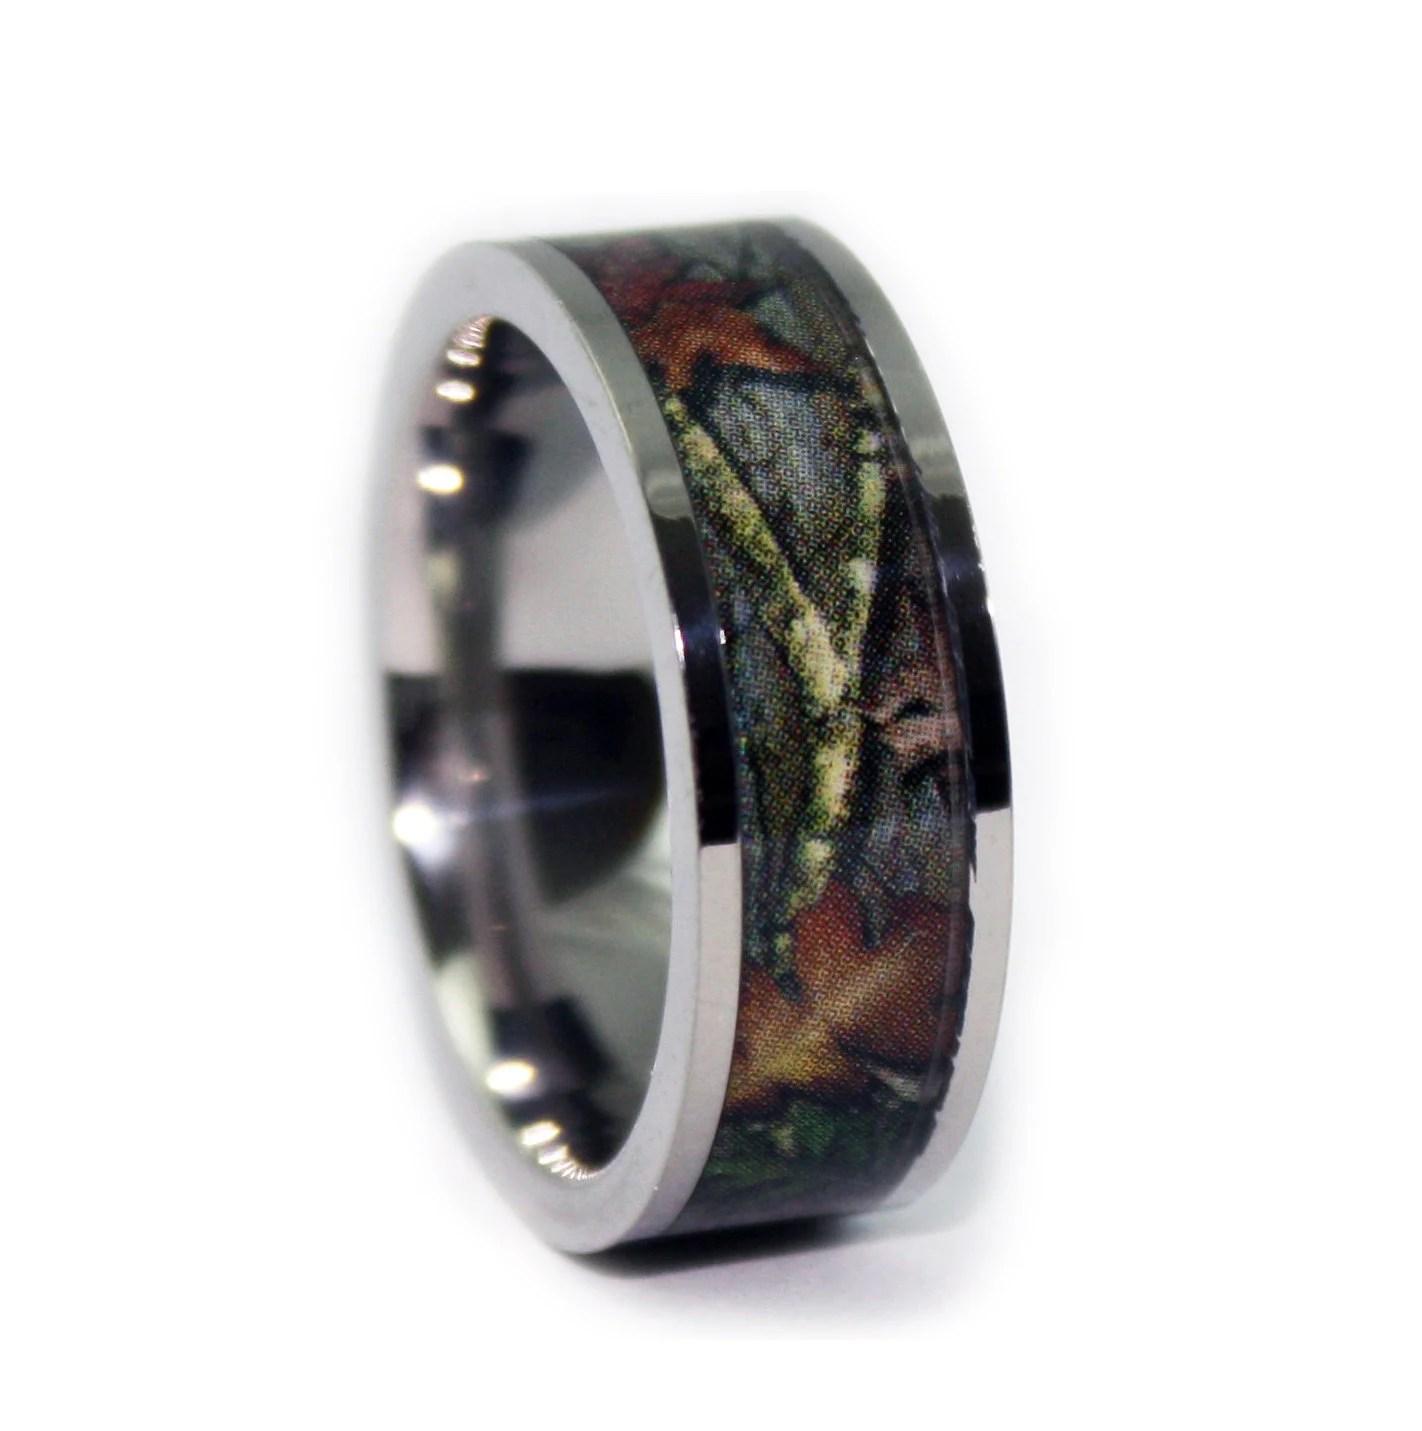 camo wedding rings deer wedding bands Camo Wedding Rings by ONE CAMO Flat Titanium Mens Wedding Band Camo Engagement Rings